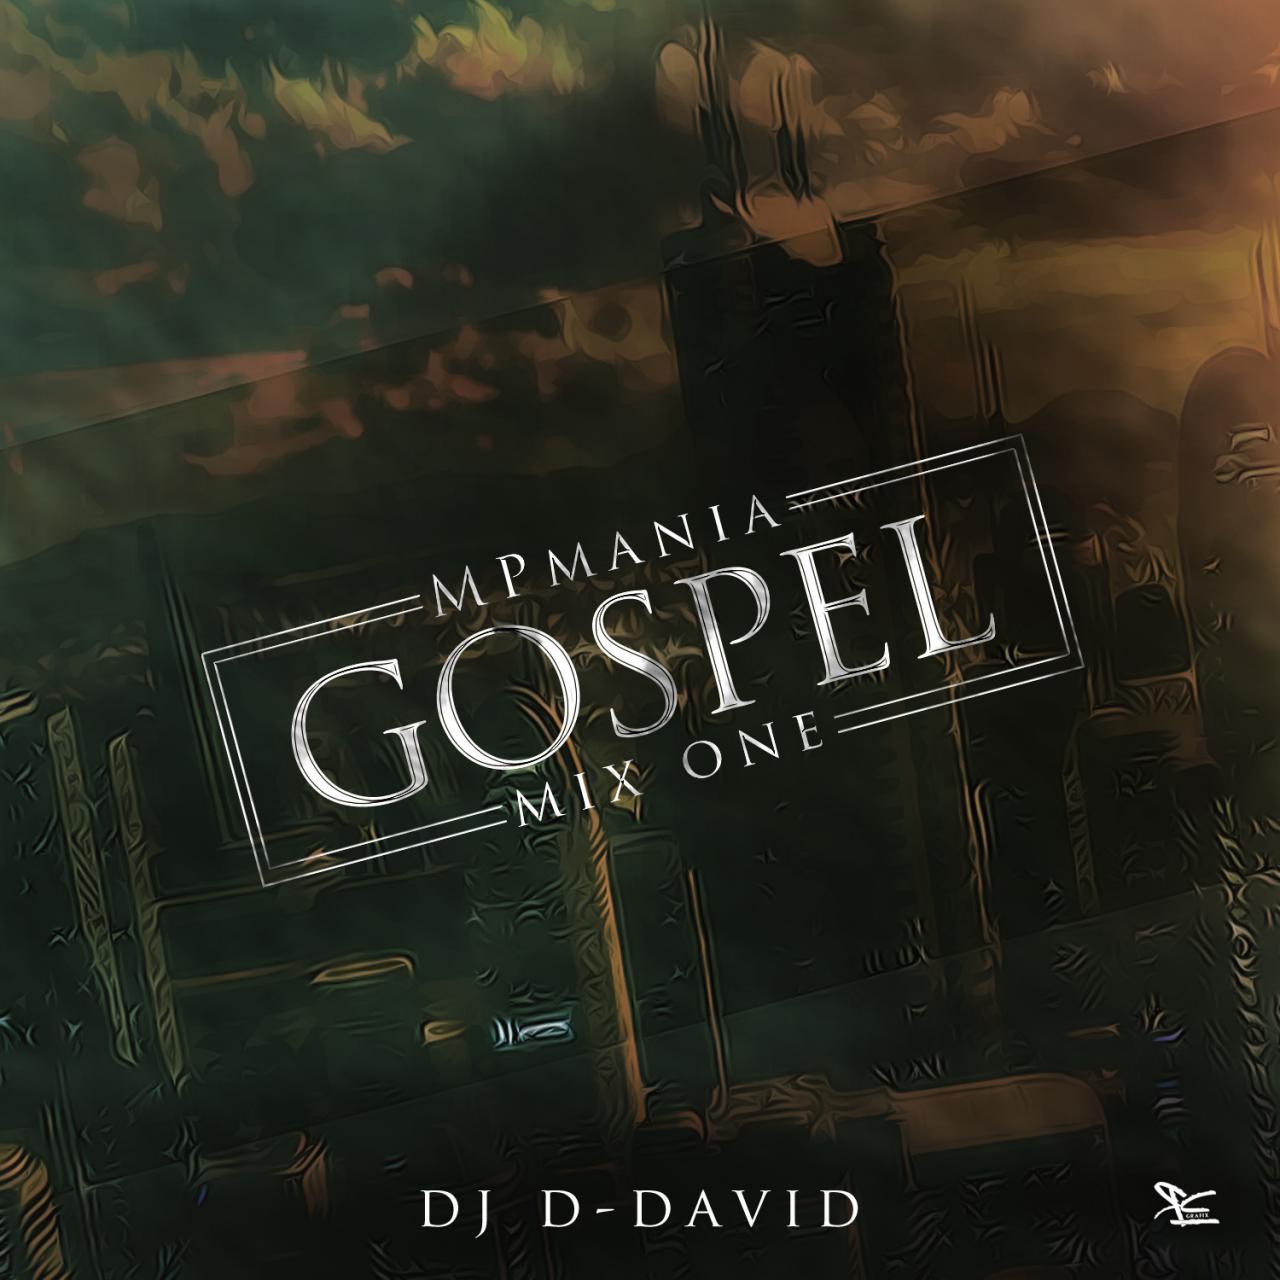 mixtape-dj-d-david-mpmania-gospel-mix-one-mp_maniac Mixtape: Dj D-David - MPmania Gospel Mix (one) |[@mp_maniac]